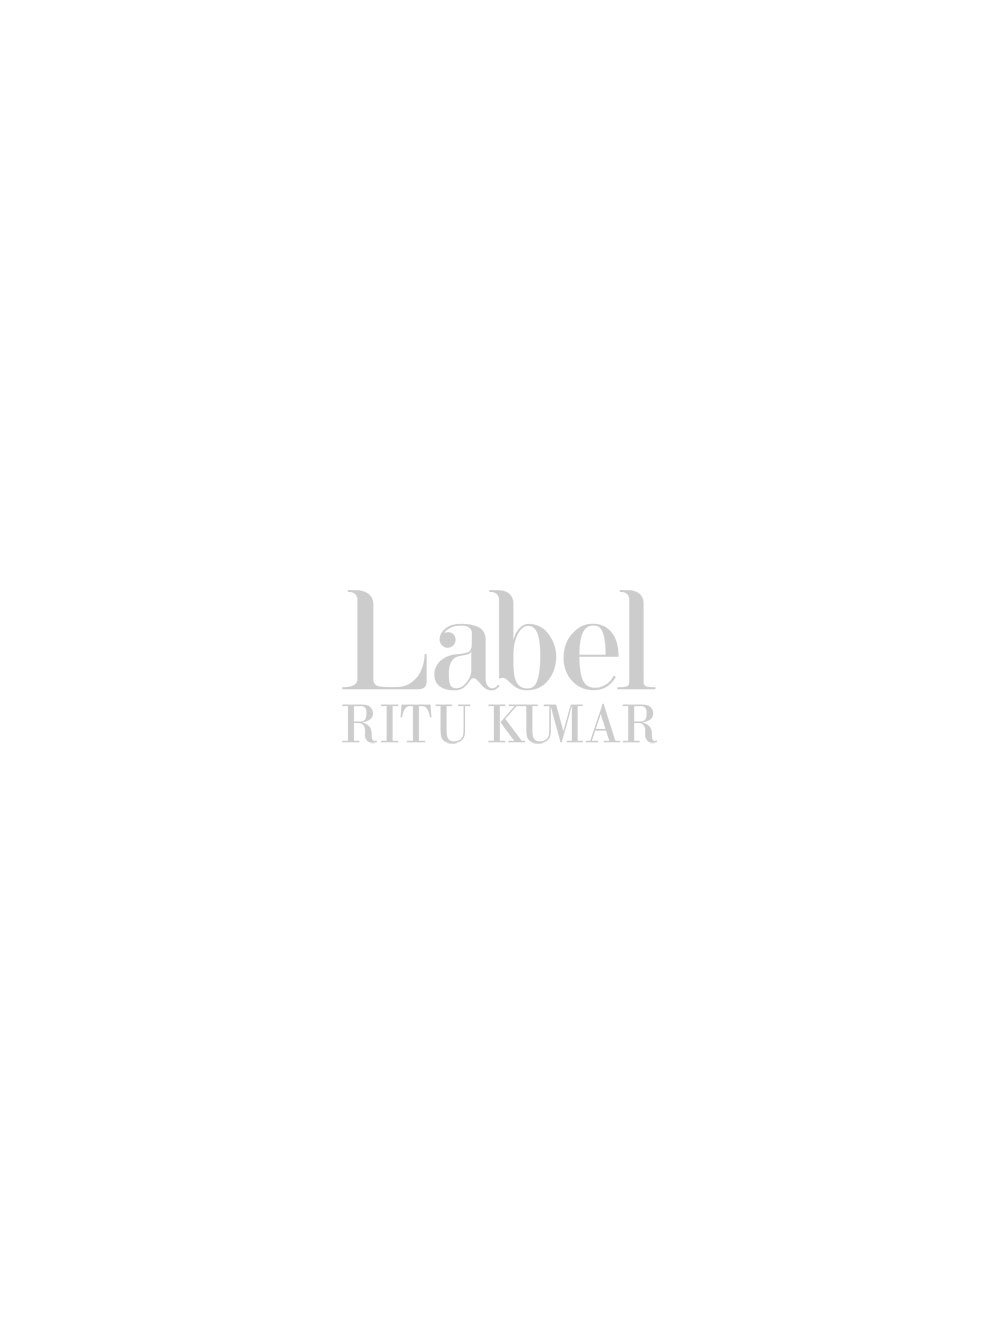 Mint Embellished Long Dress by label ritu kumar